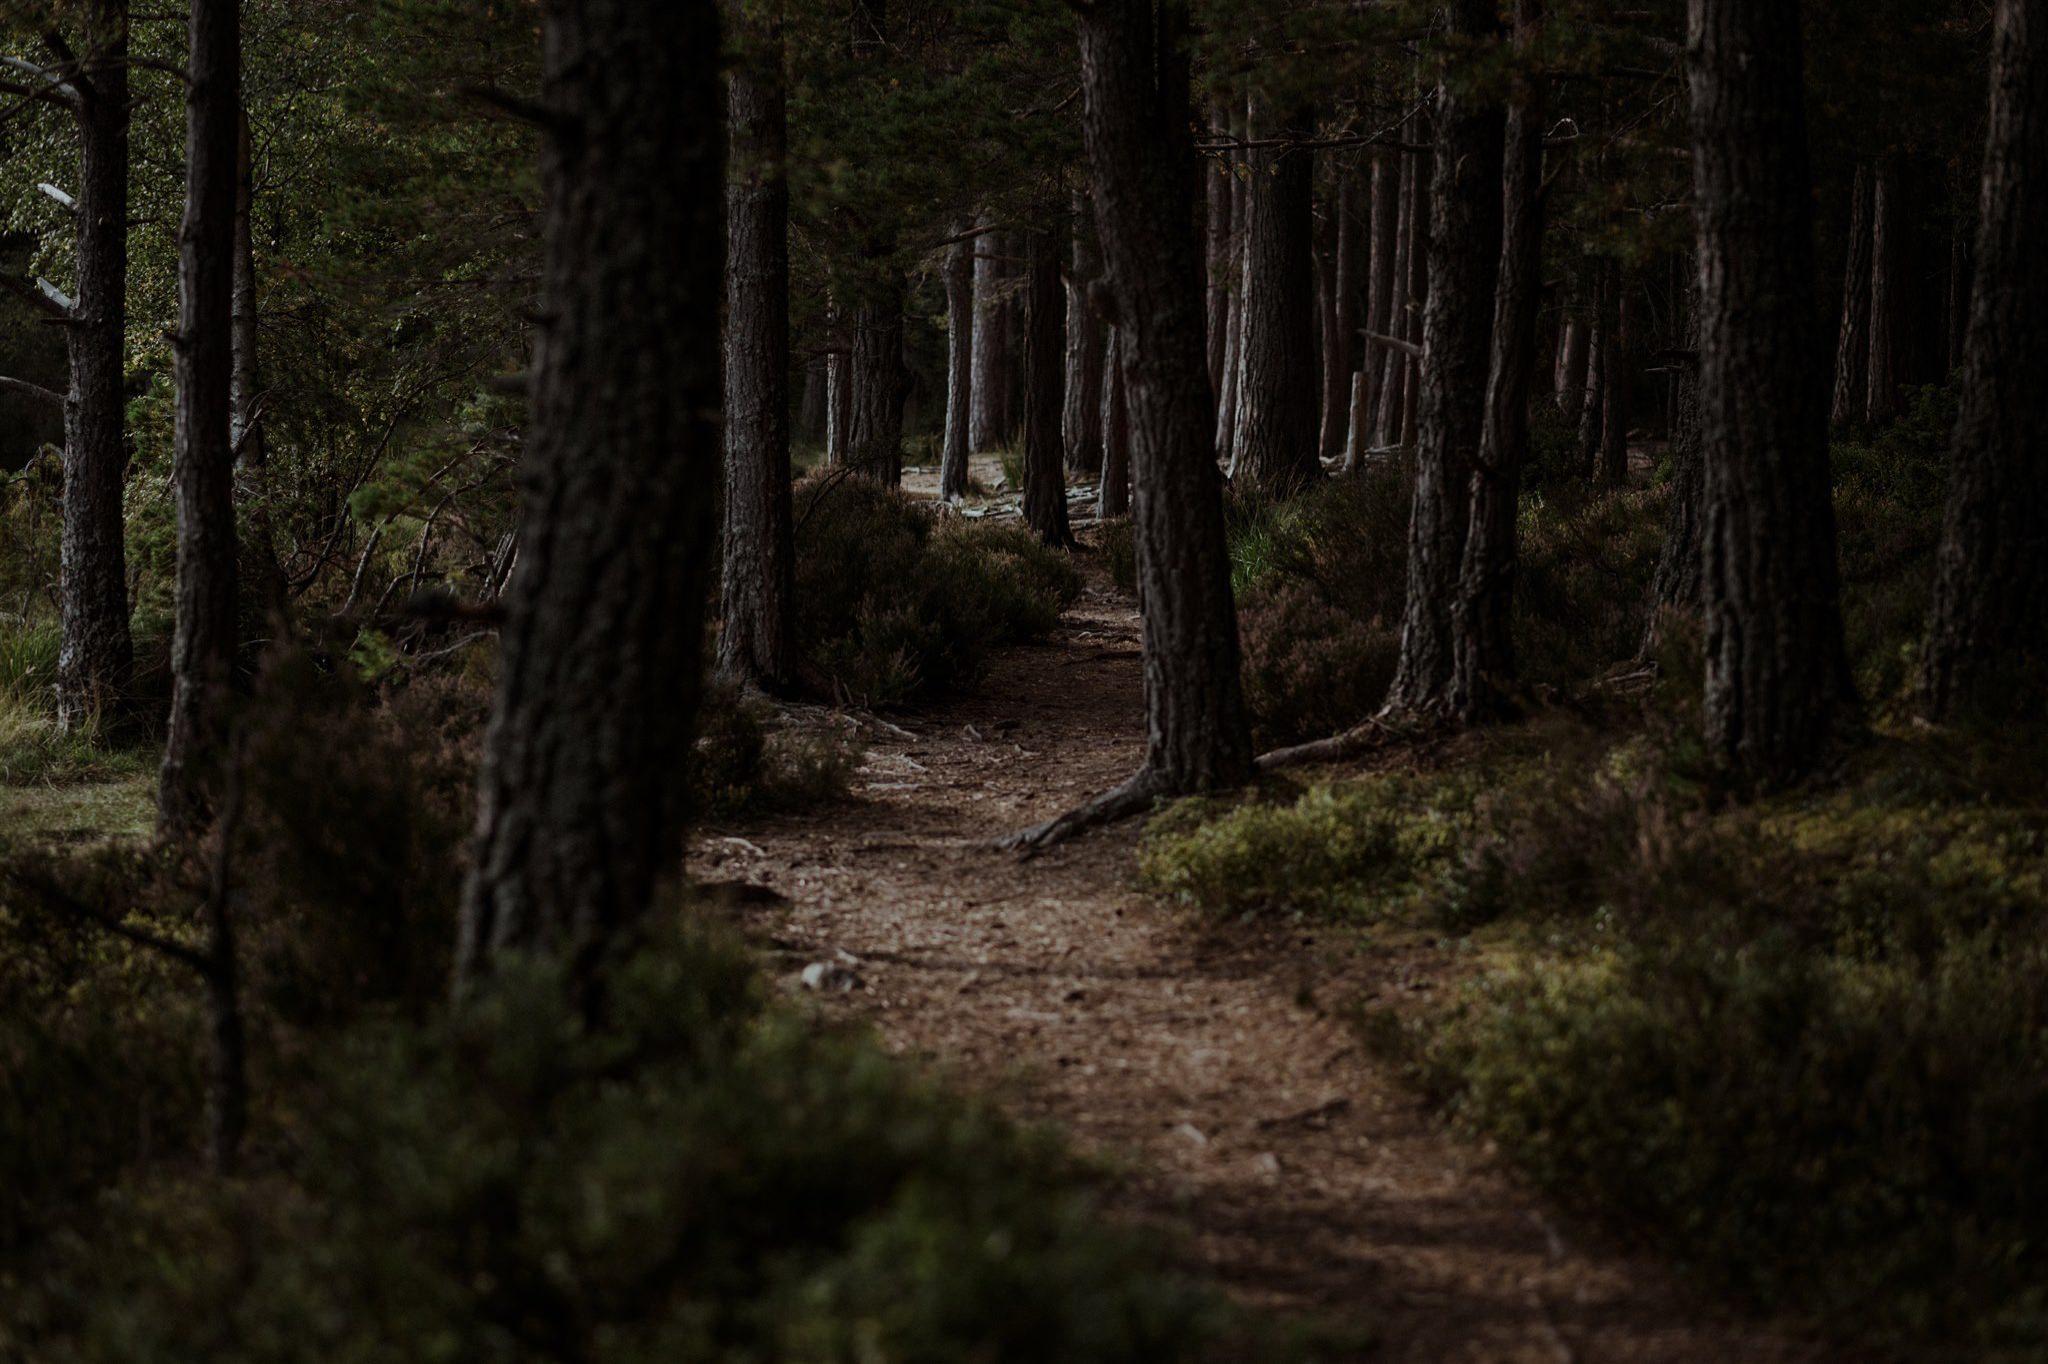 Path through the woods near Loch Garten in the Cairngorms Scotland